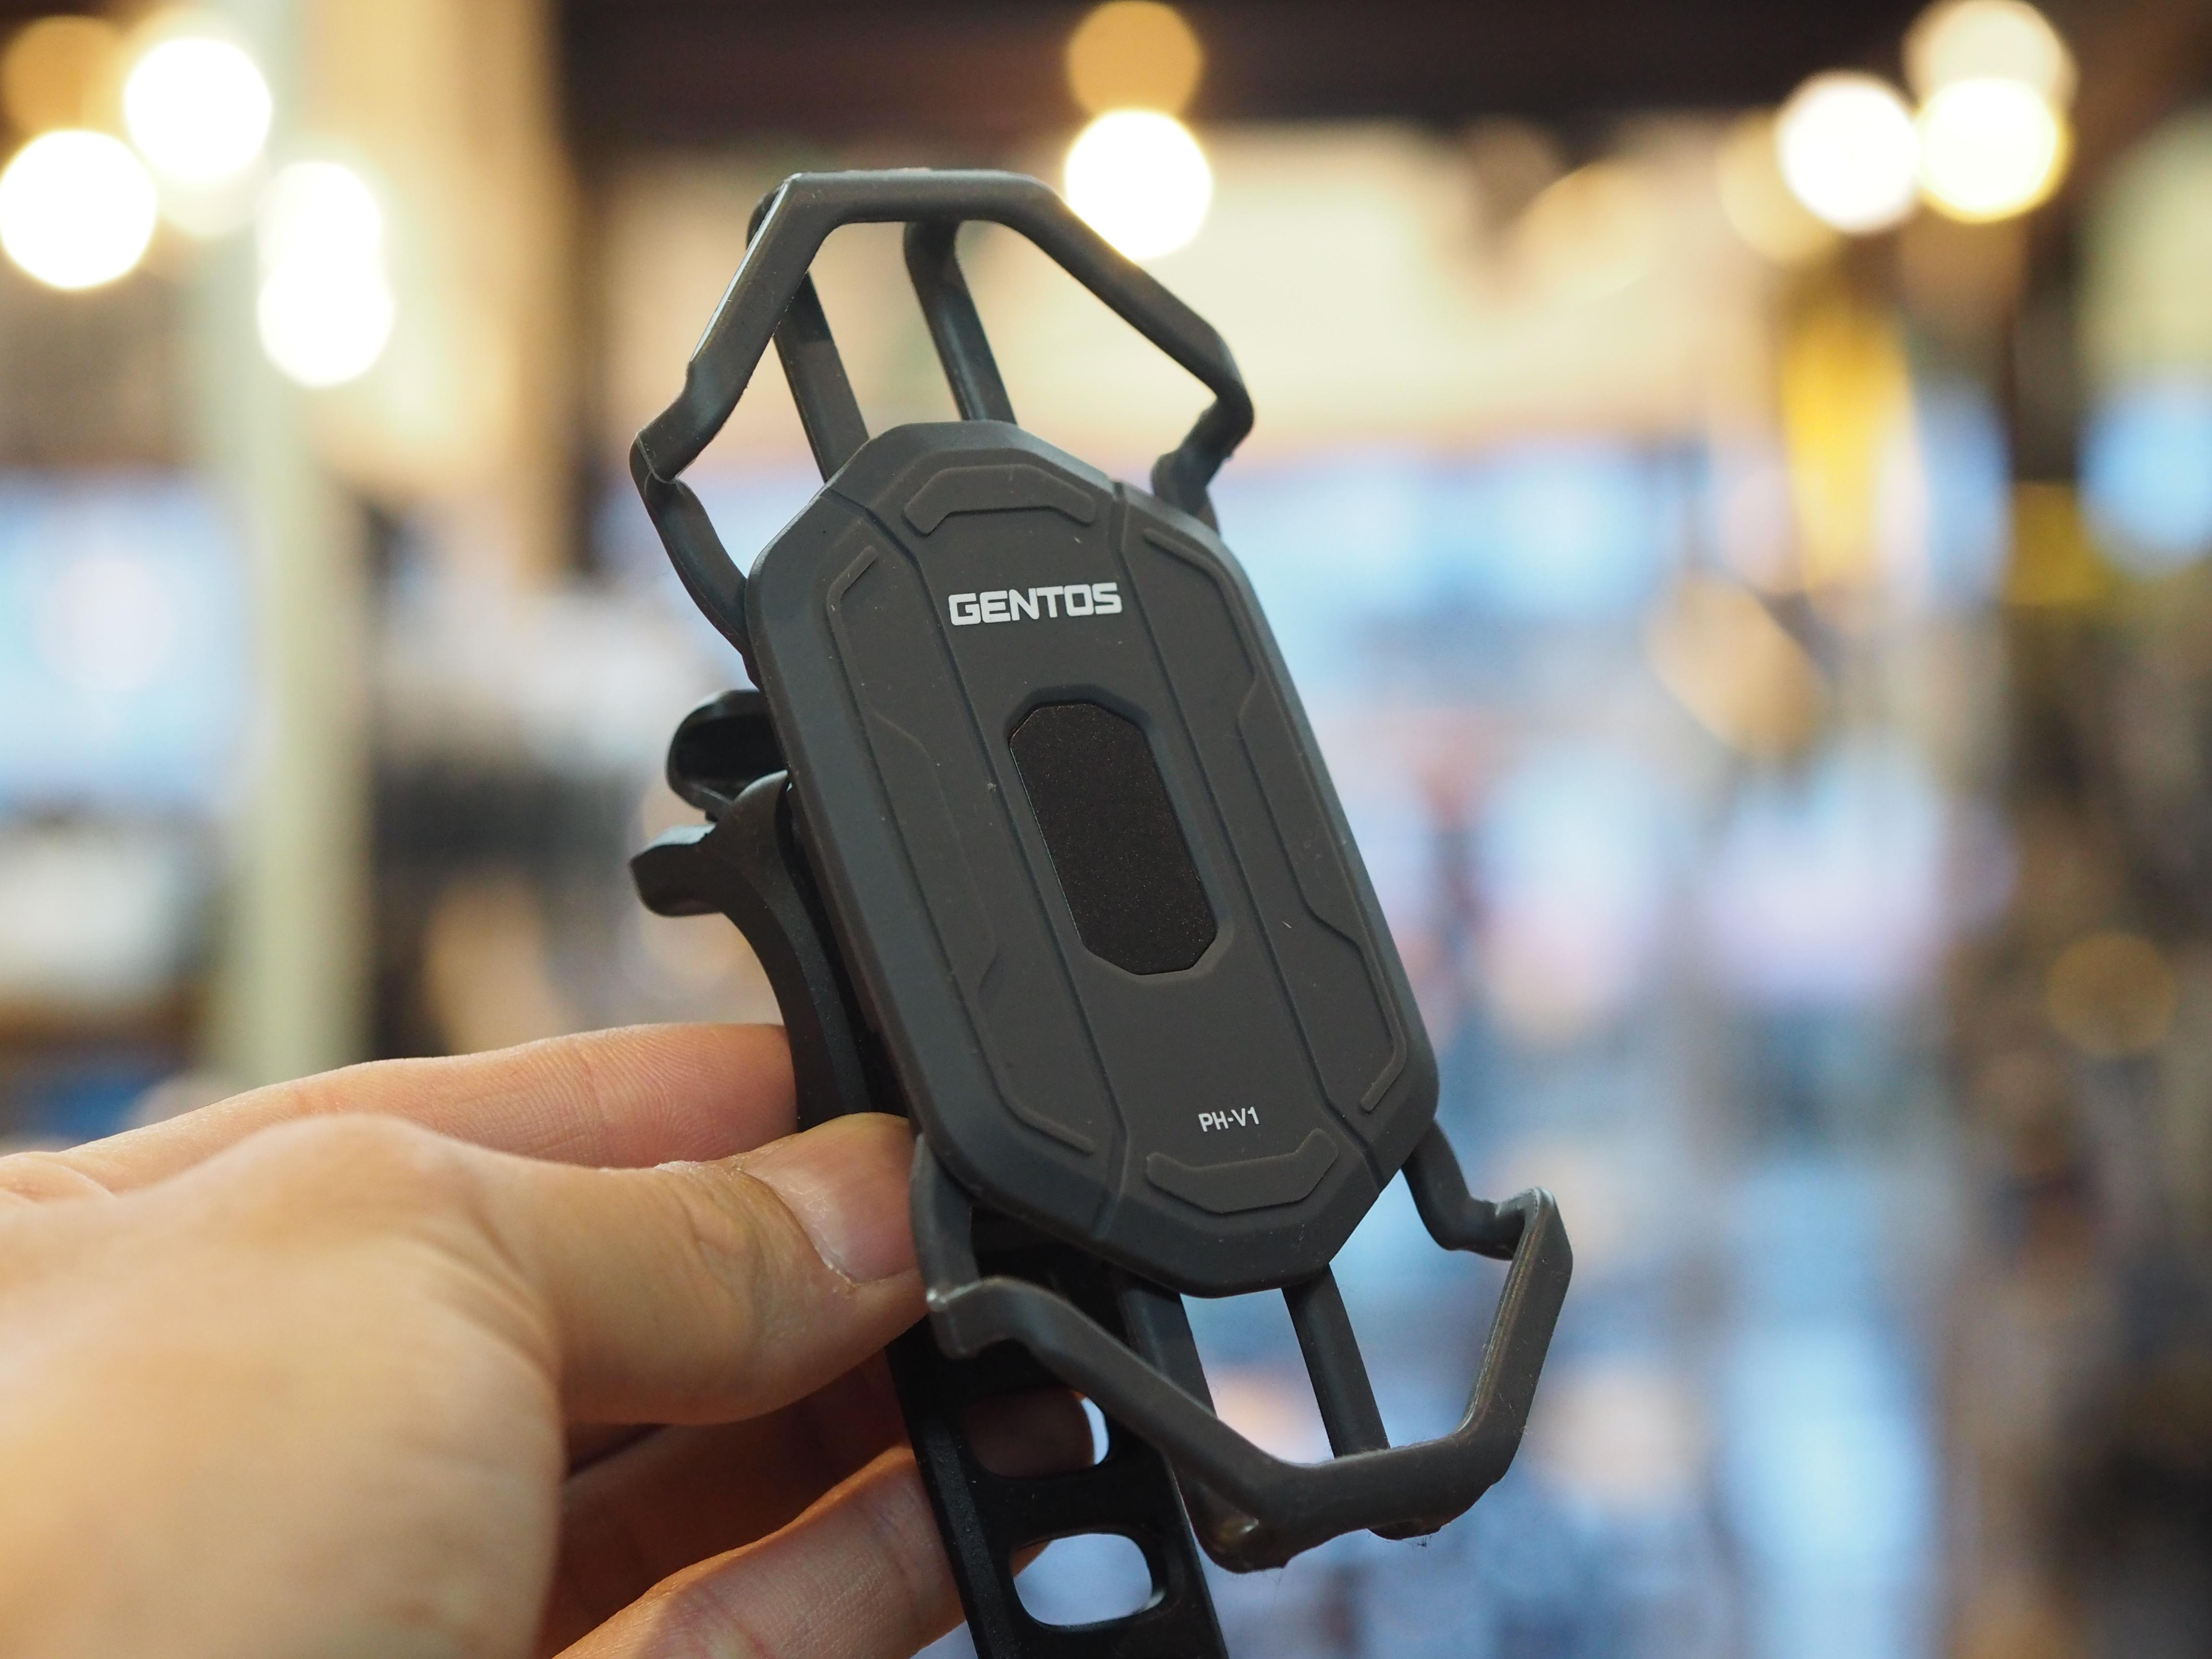 GENTOS PH-V1 スマートフォンホルダー